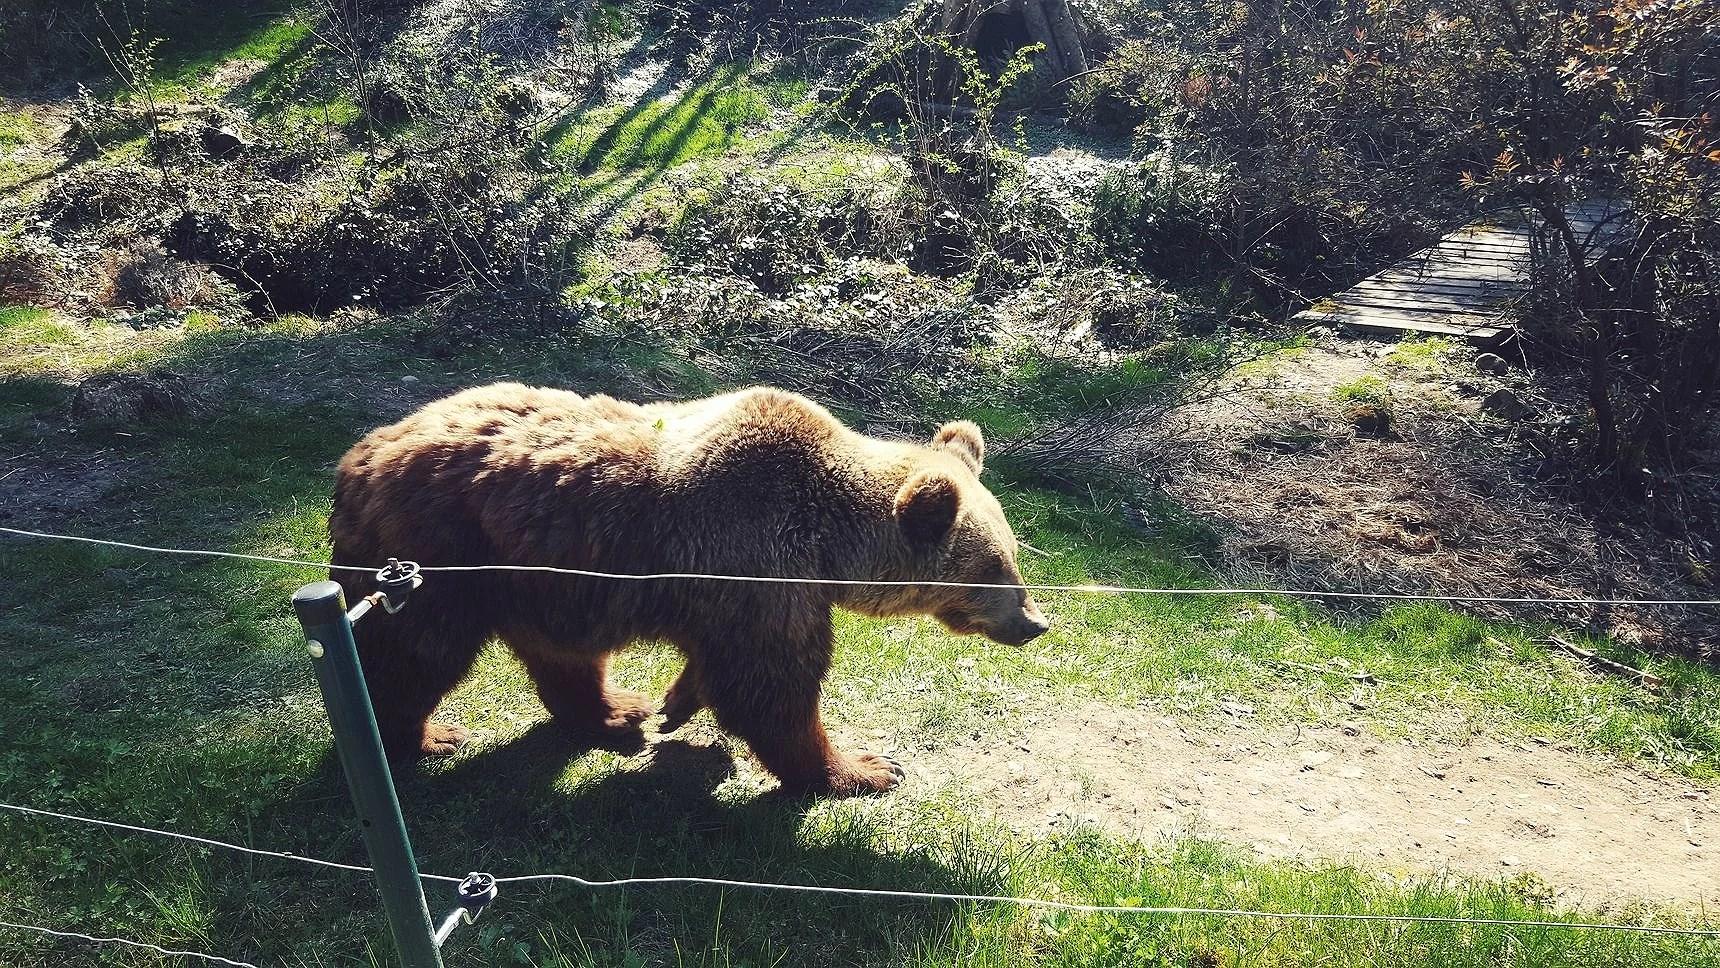 Bärenpark Bad Rippoldsau-Schapbach